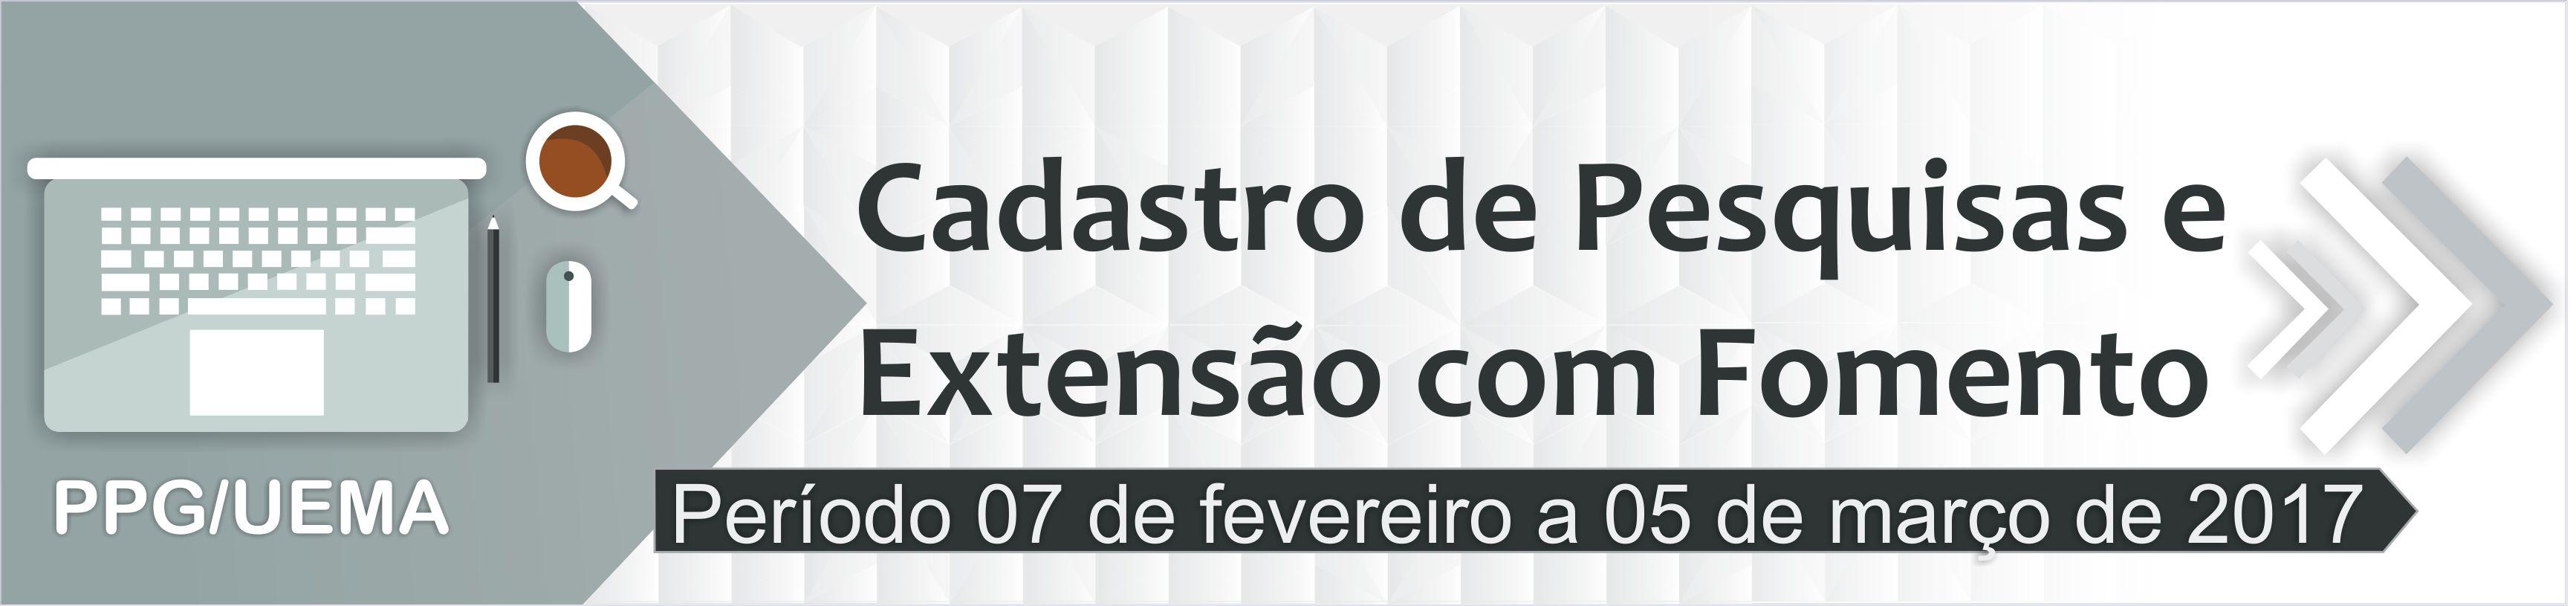 banner_fomento_2017-1